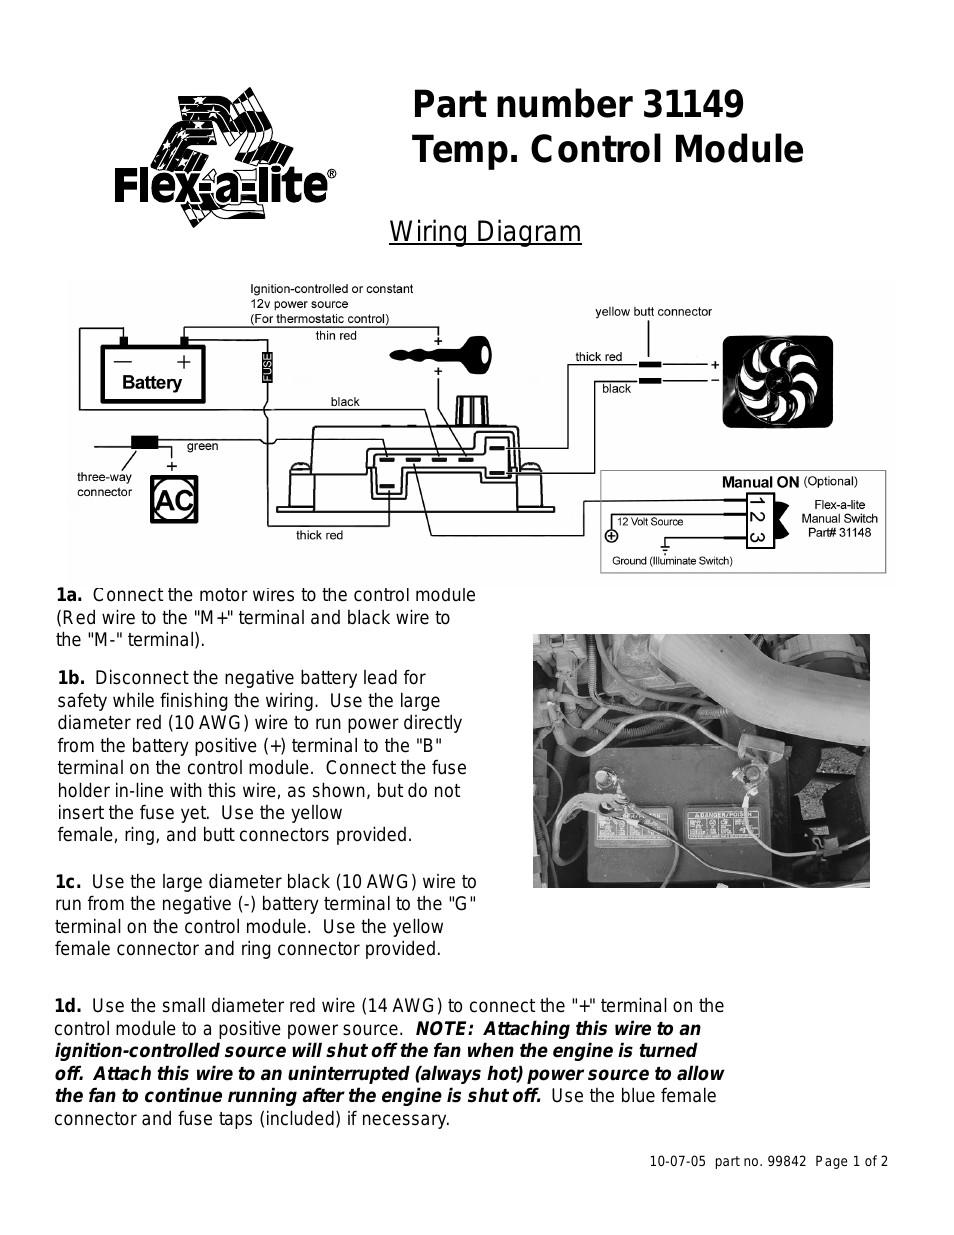 Flex A Lite Temp Control Module User Manual 2 Pages In Fan For